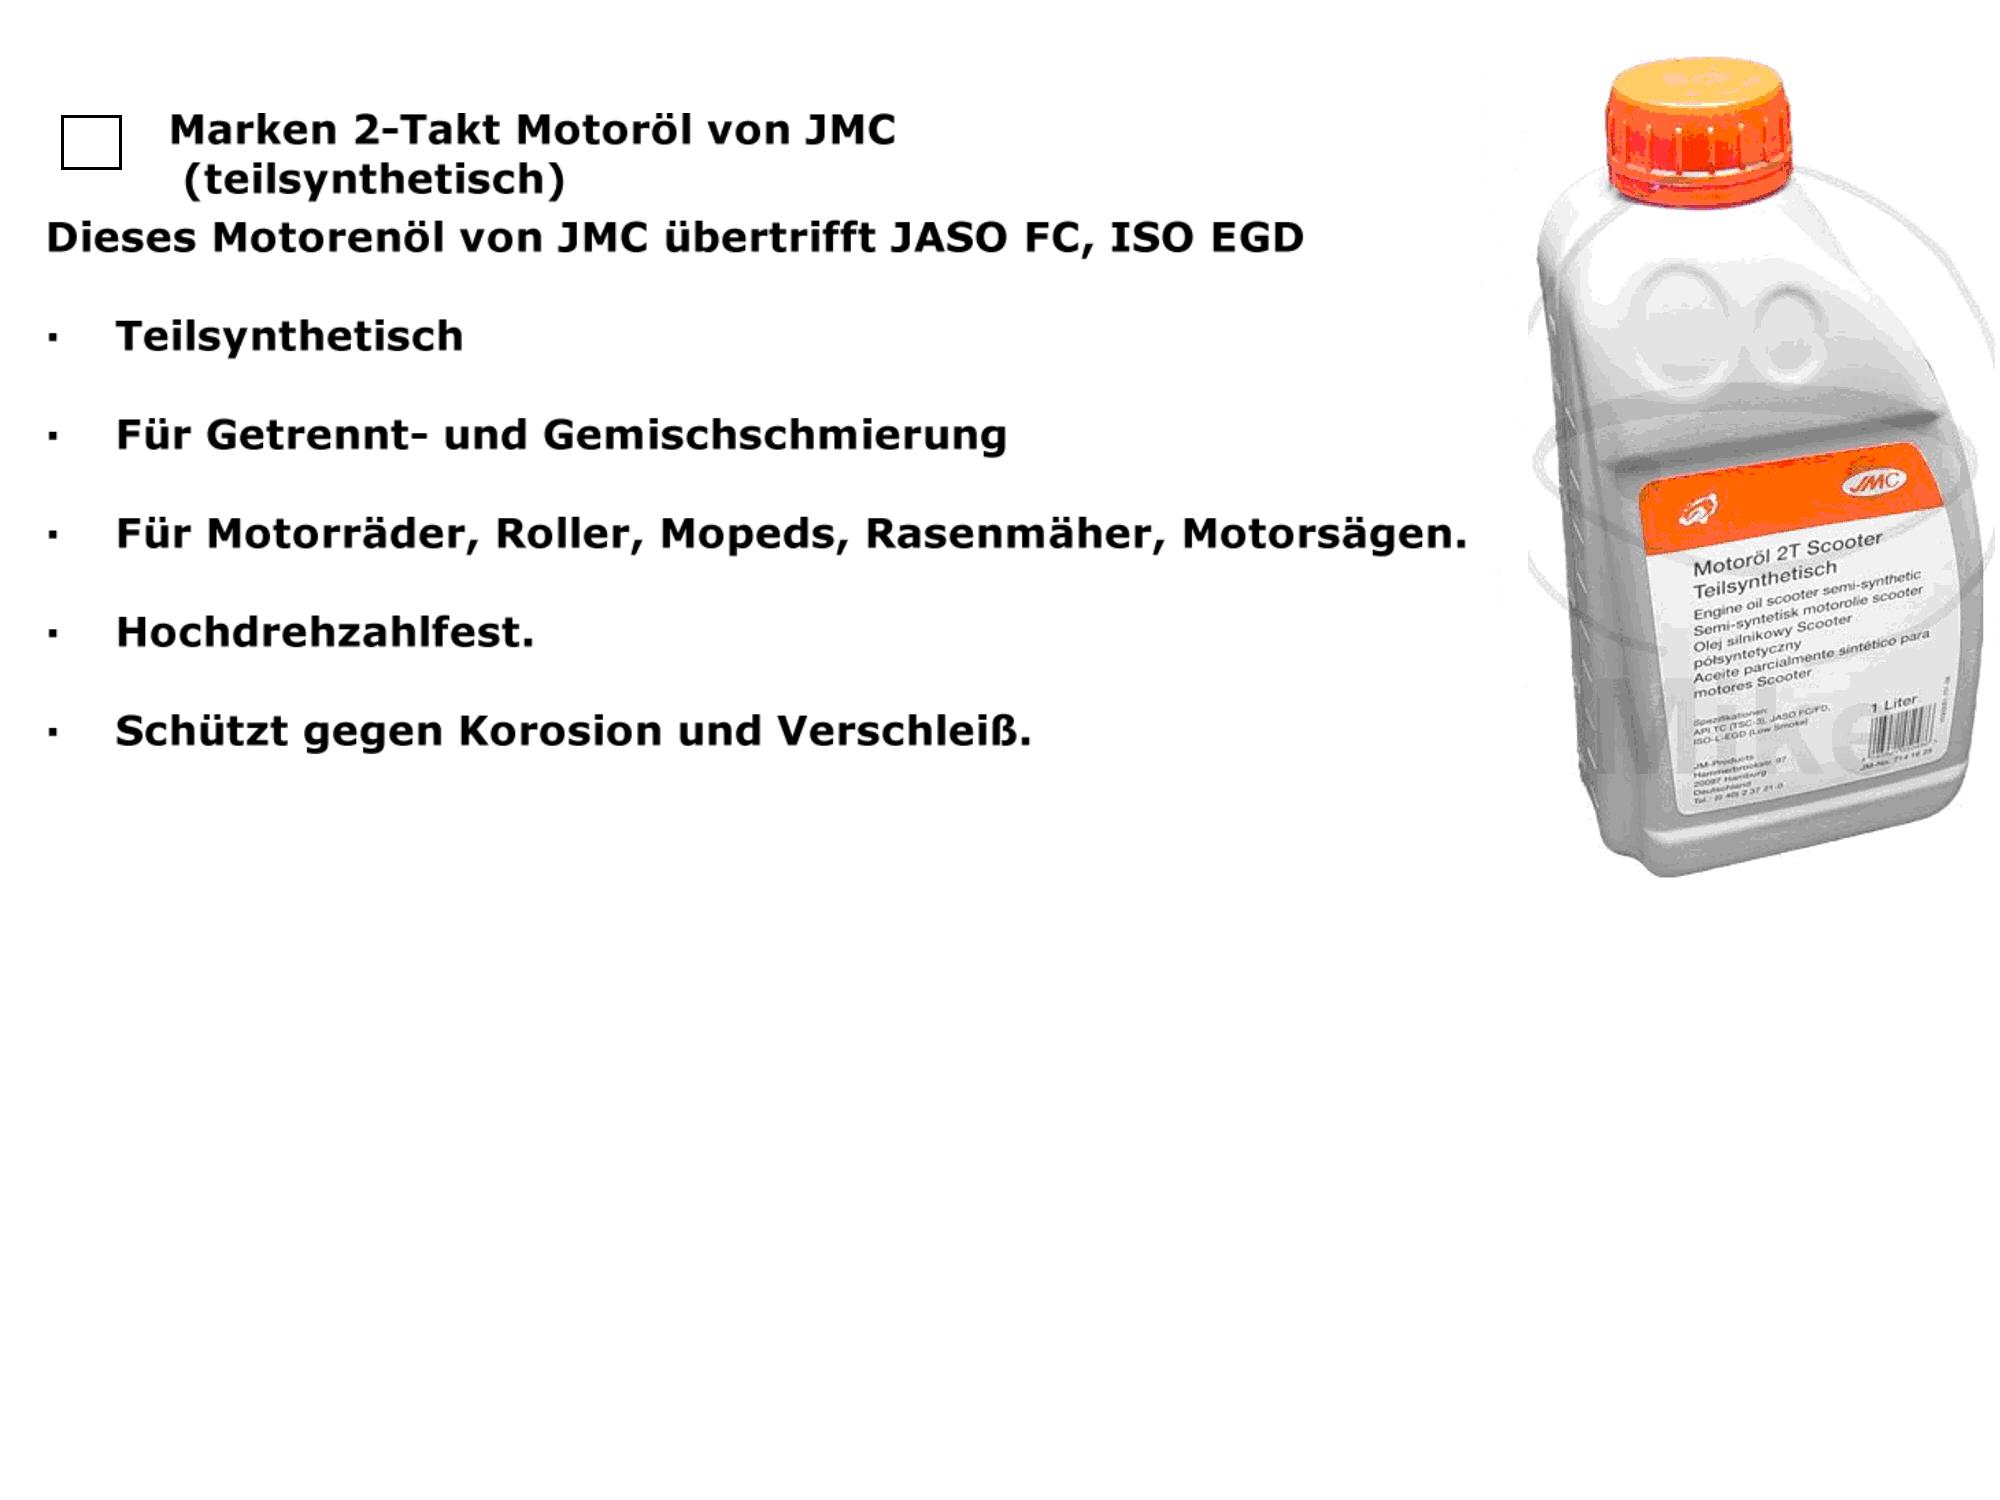 2-Takt Öl teilsynthetisch